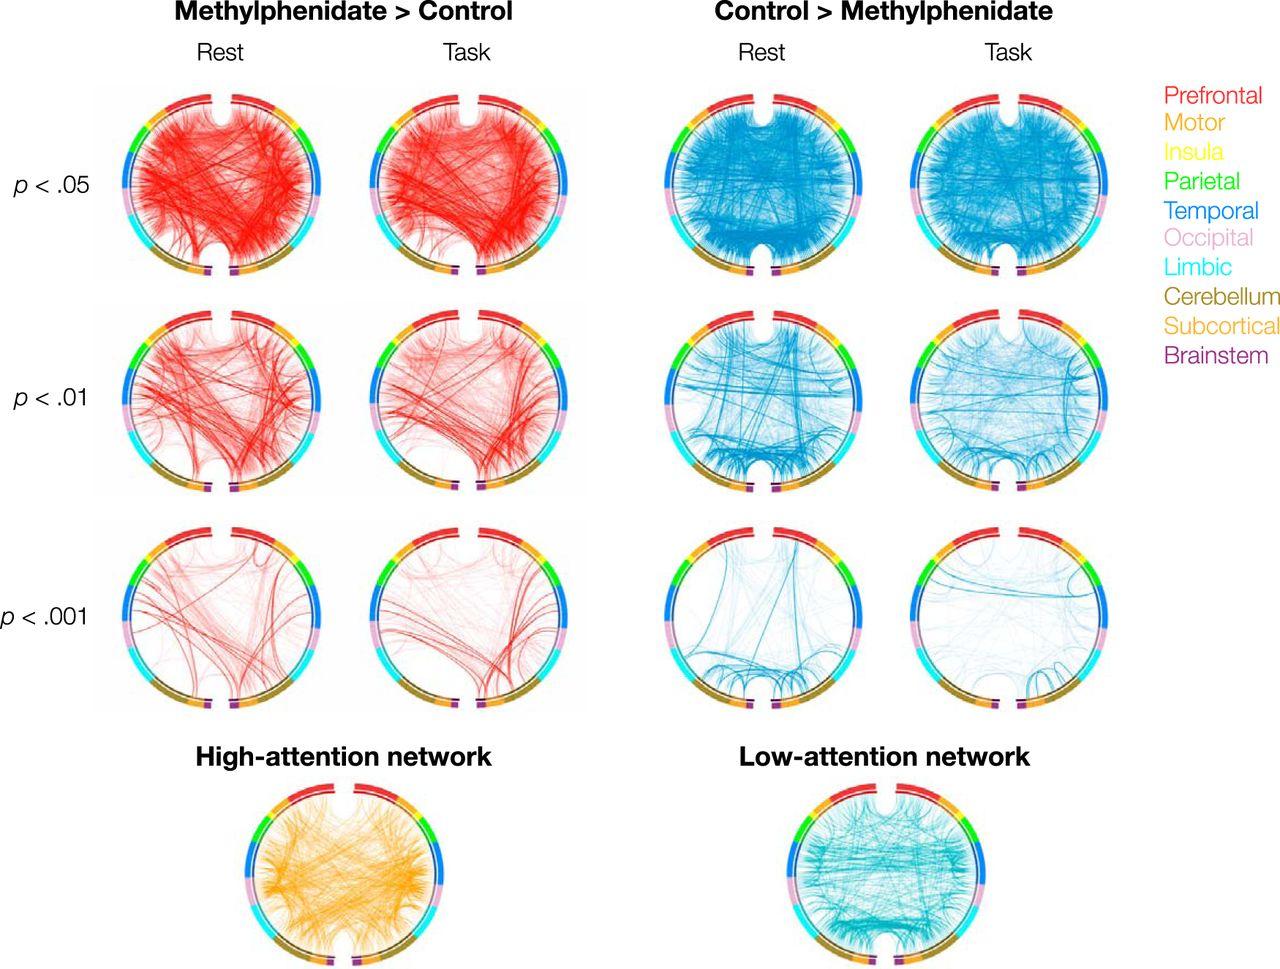 Methylphenidate Modulates Functional Network Connectivity to Enhance